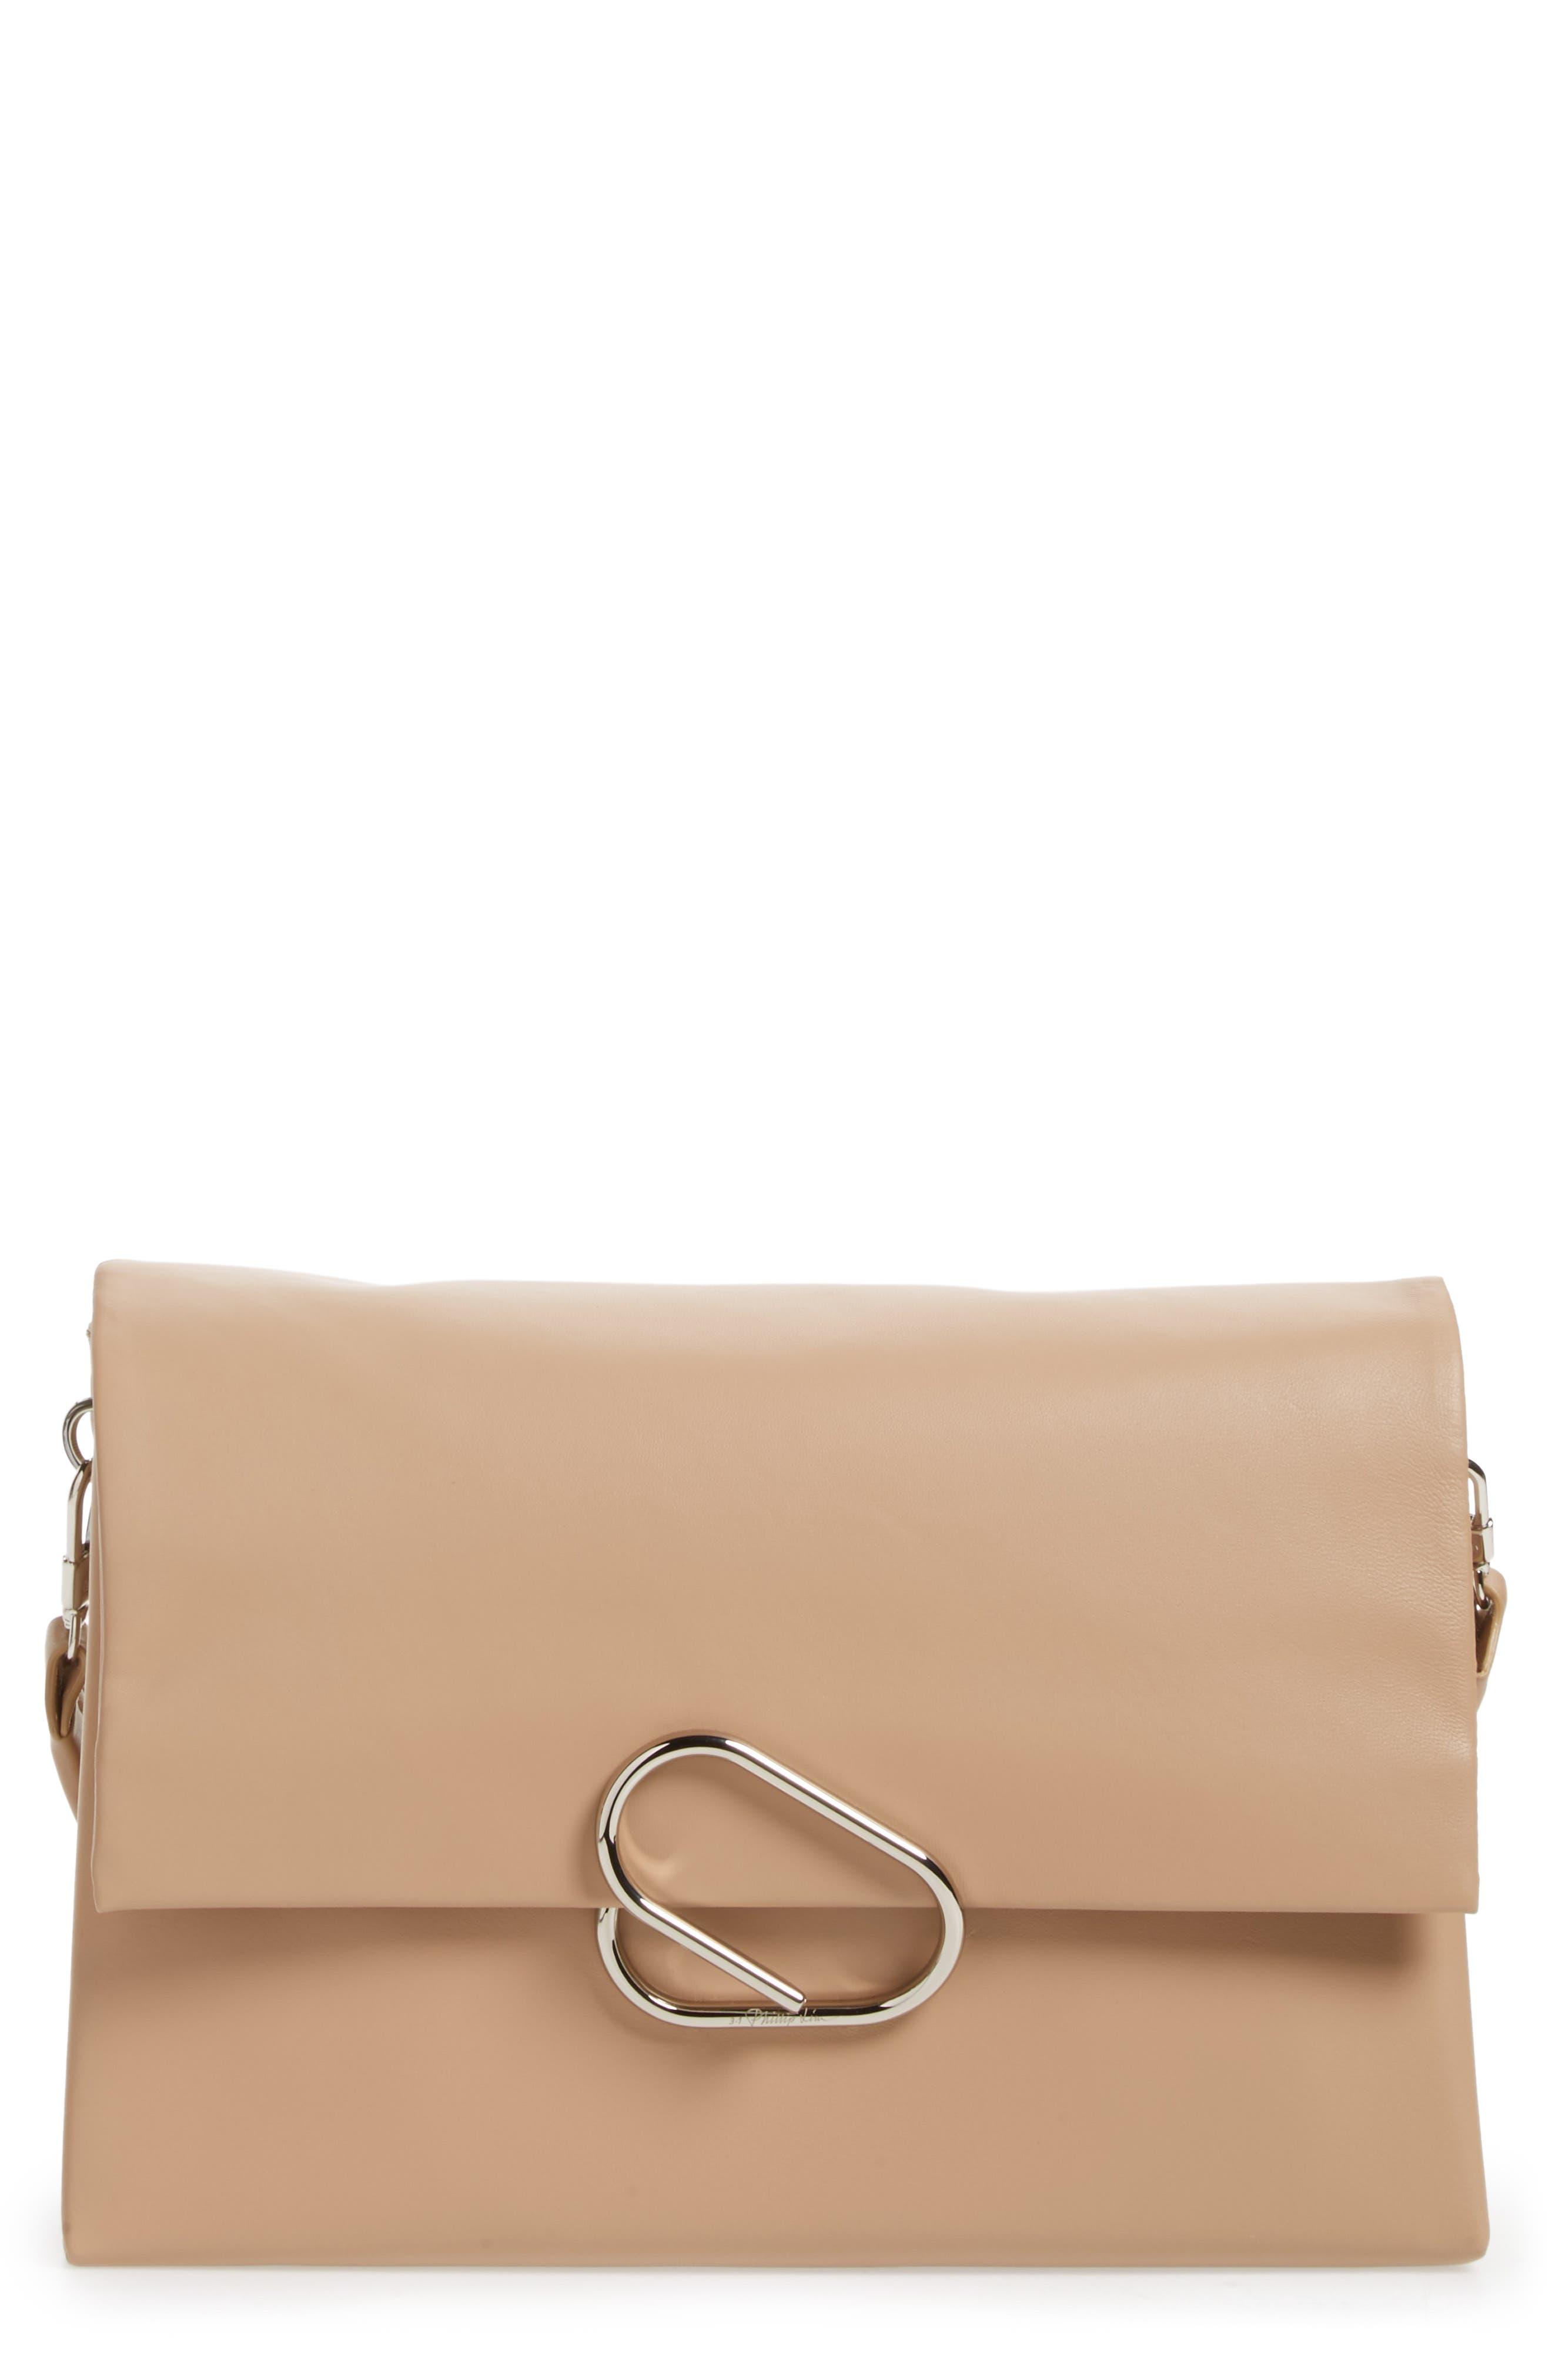 Oversized Alix Flap Leather Shoulder Bag,                             Main thumbnail 1, color,                             Fawn